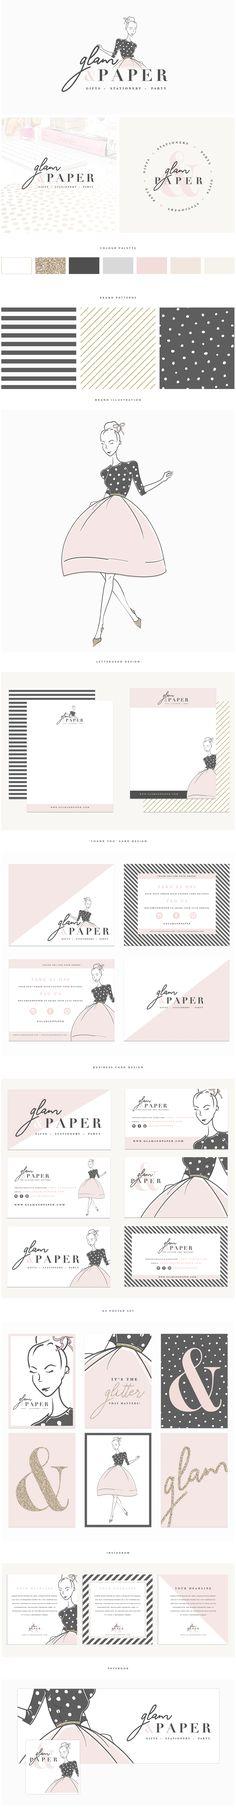 Brand Design | Glam & Paper » Brand Me Beautiful